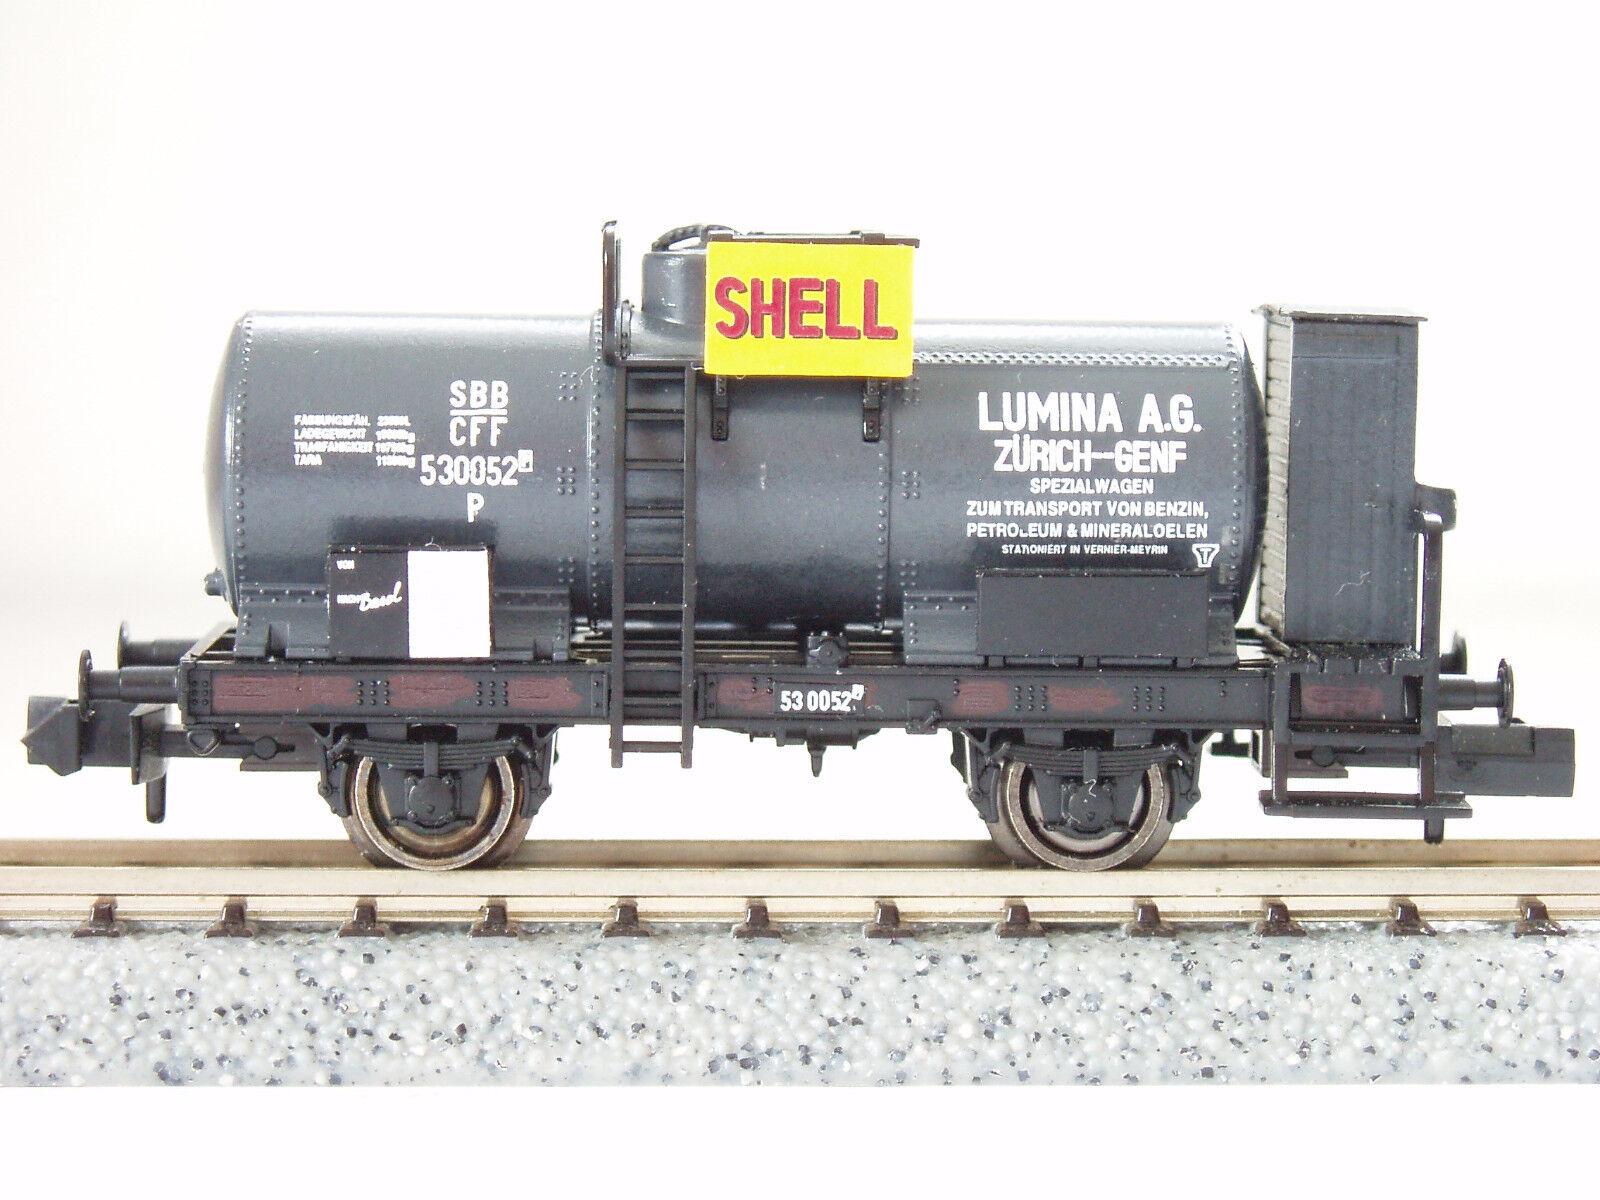 SBB Kesselwagen  SHELL Lumina A.G.  530052 (3007) JURETIC Handarbeitsmodell